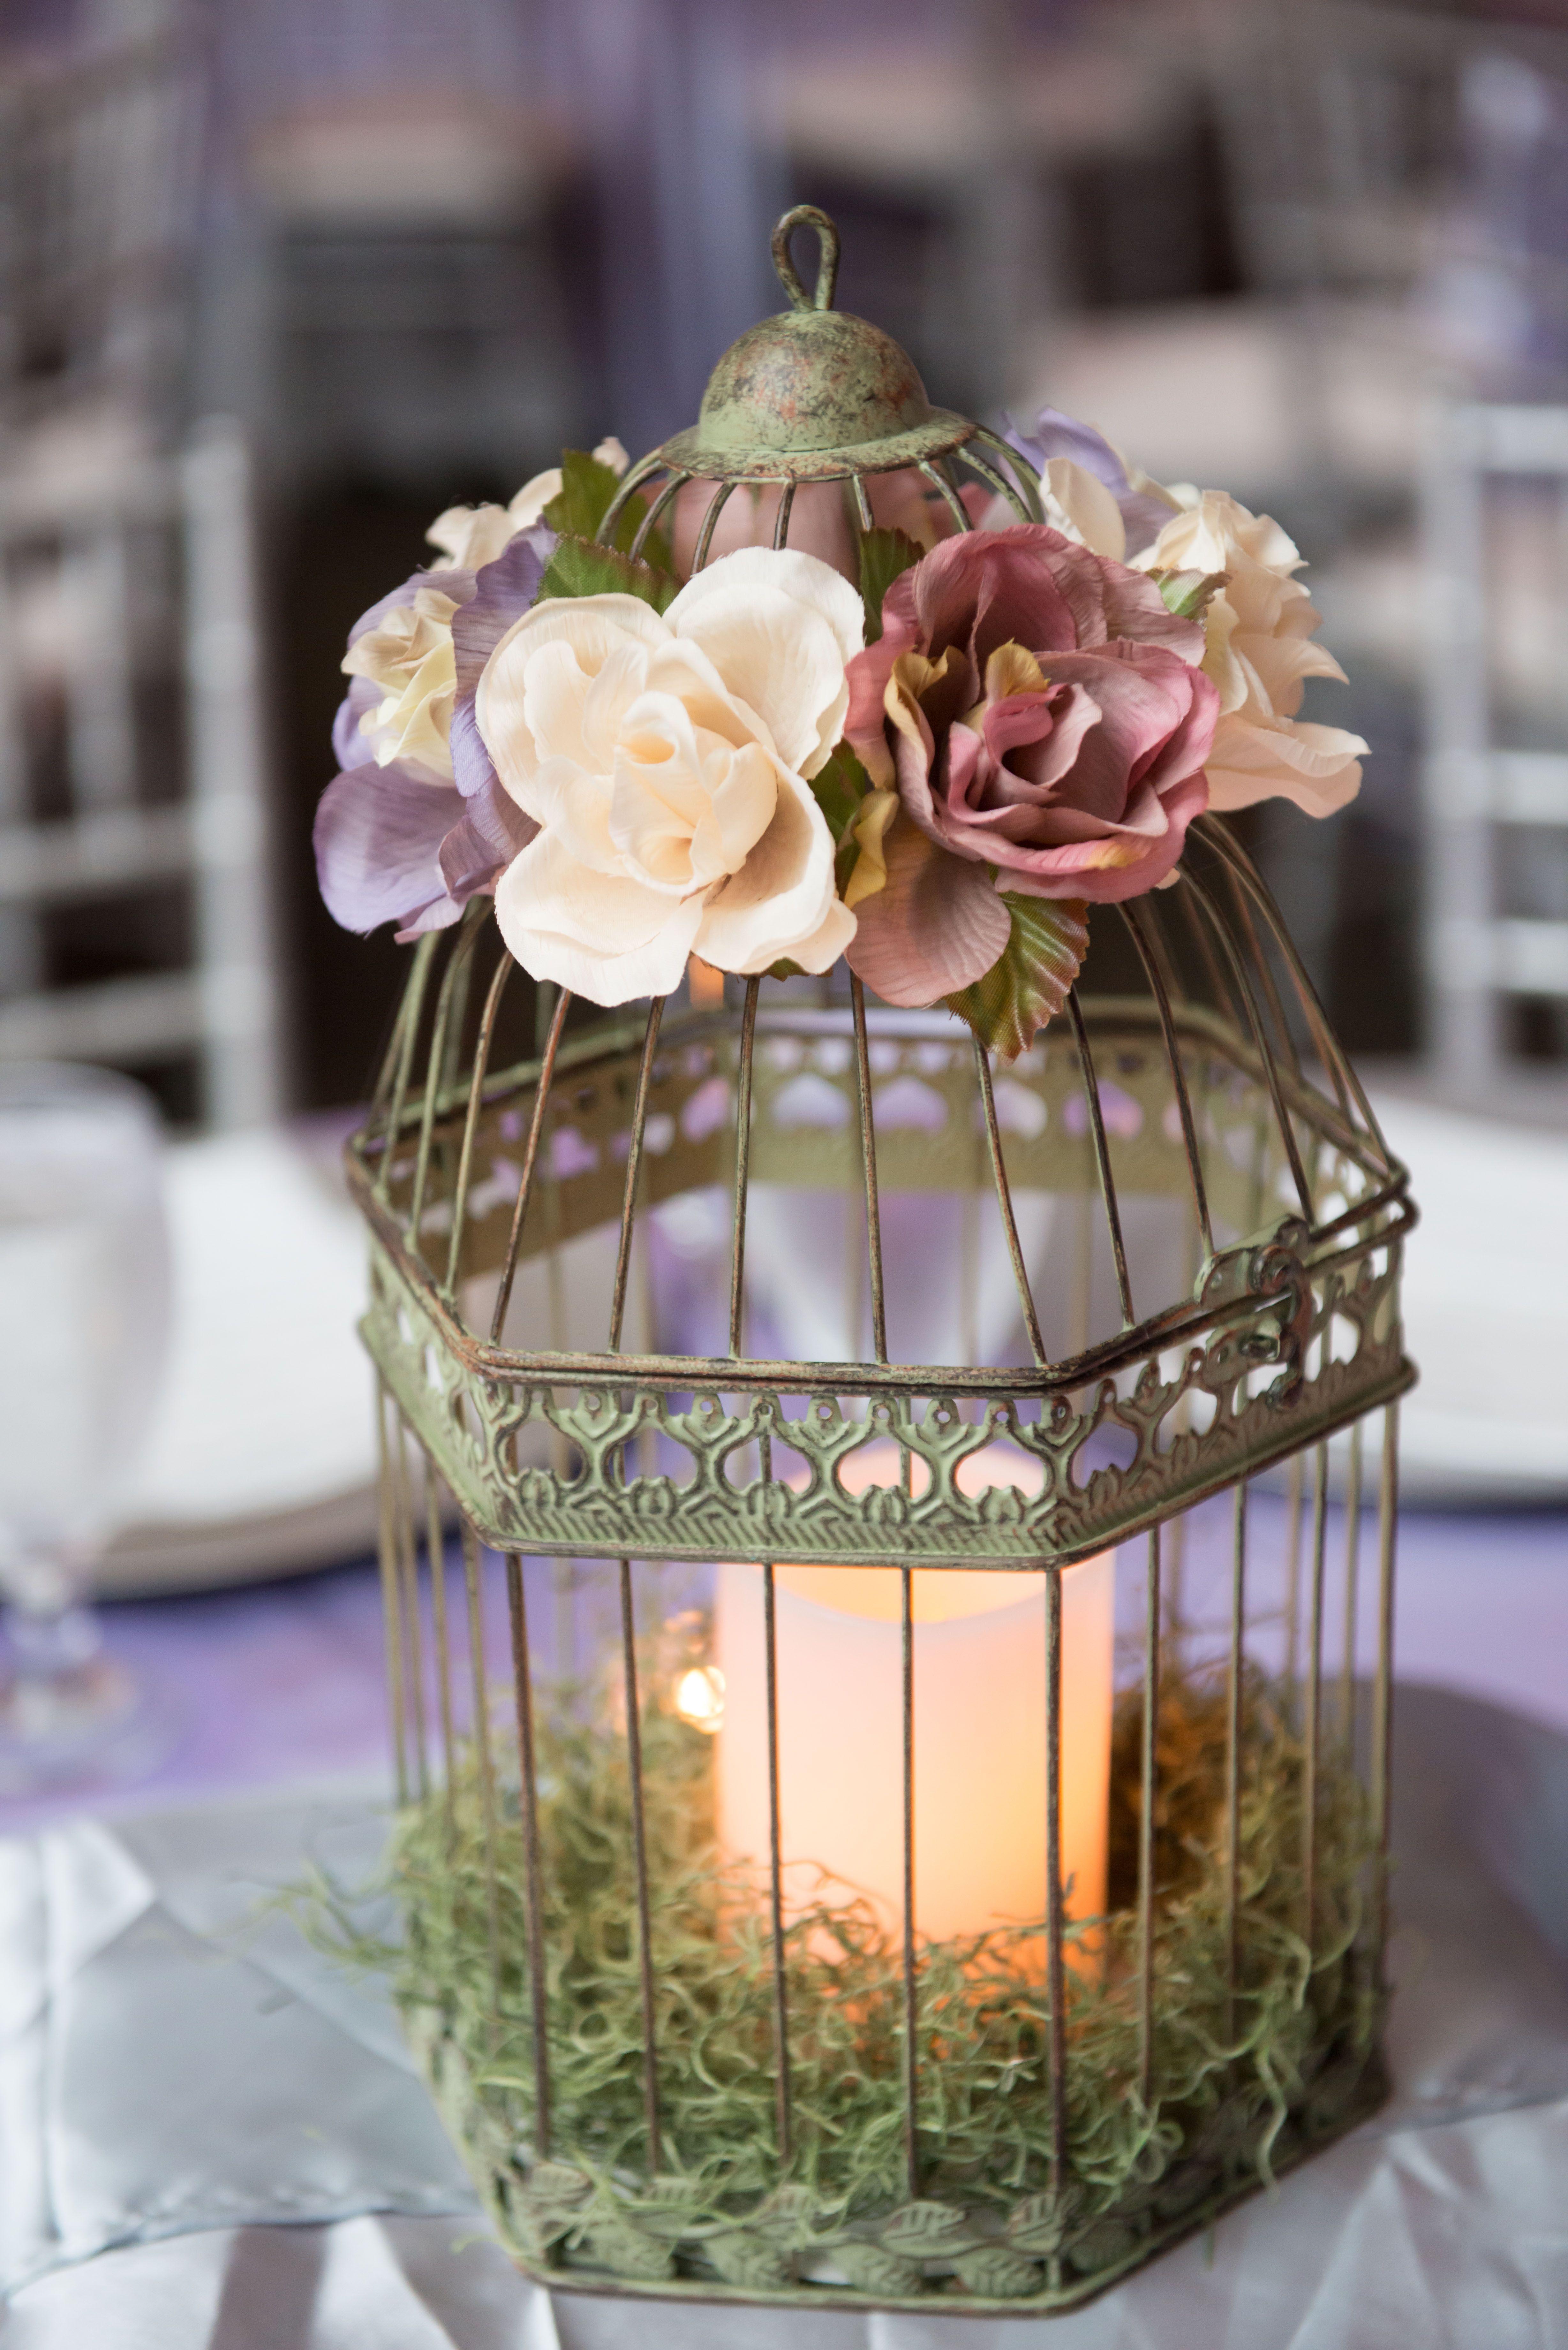 My Diy Wedding Birdcage Centerpieces With Silk Flowers Battery